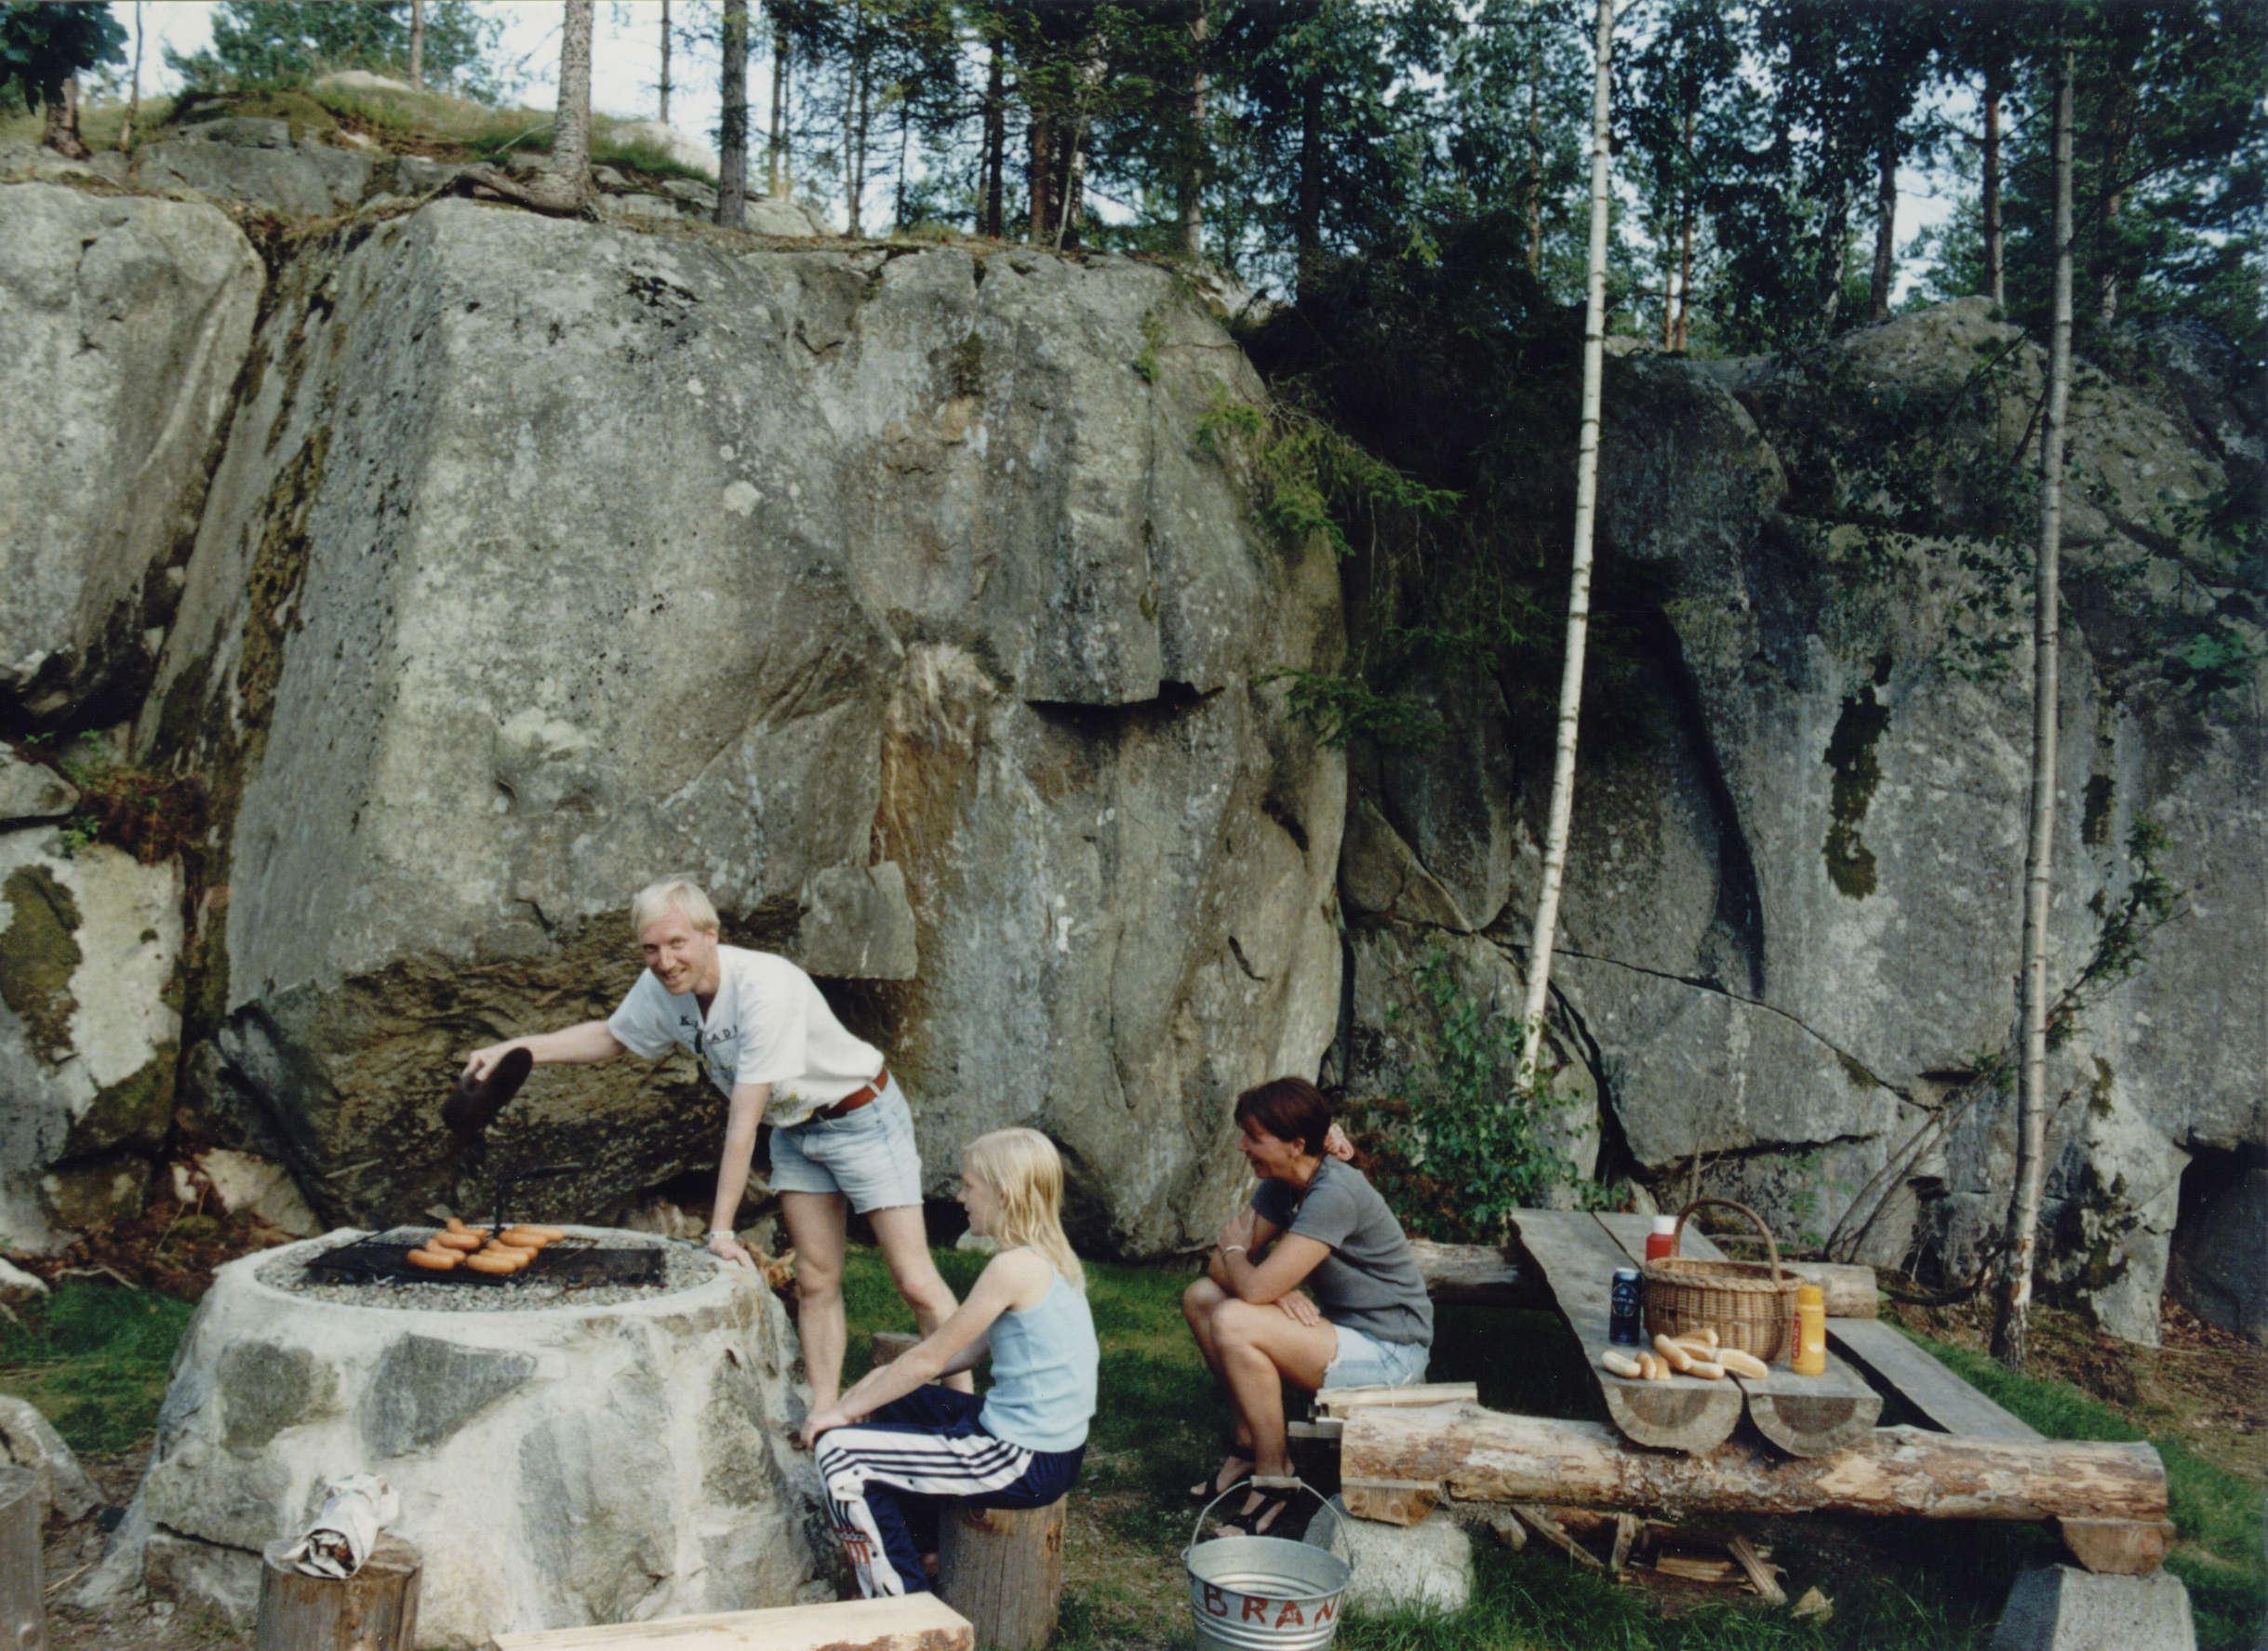 Hätteboda Wildernesscamping - SCR VM